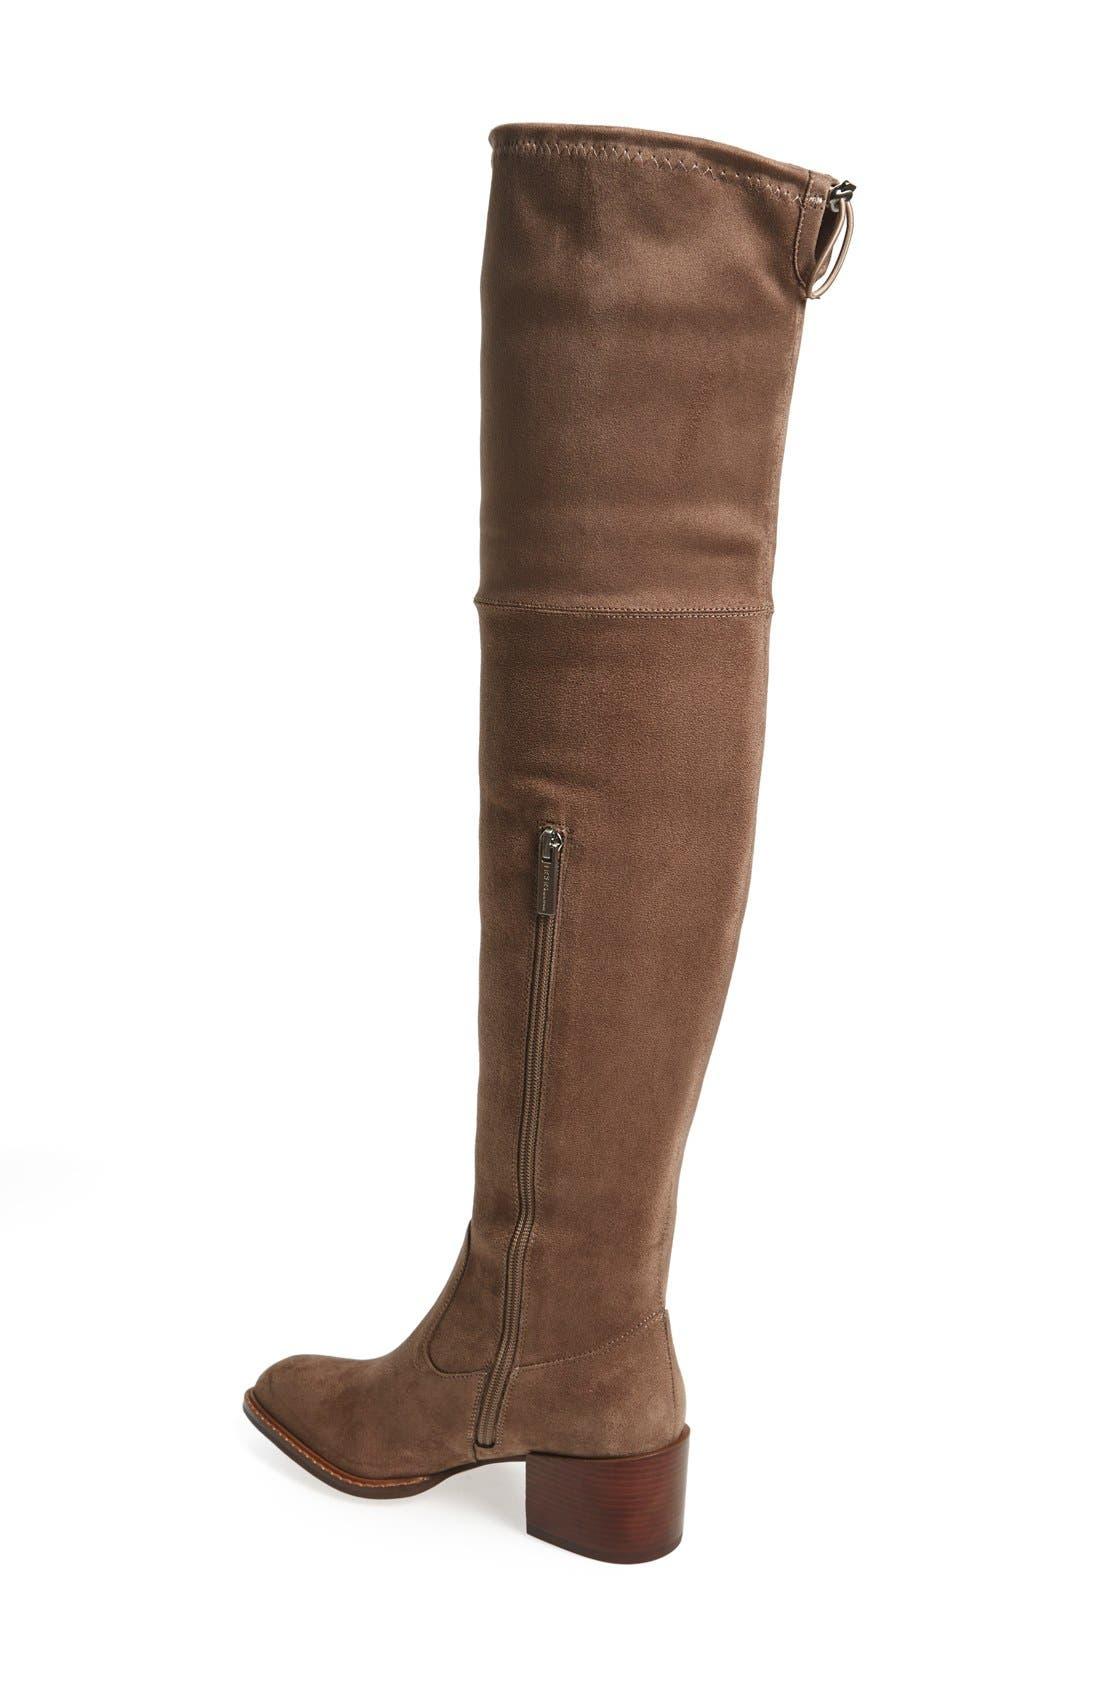 Alternate Image 2  - BCBGeneration 'Sawyar' Over the Knee Boot (Women)